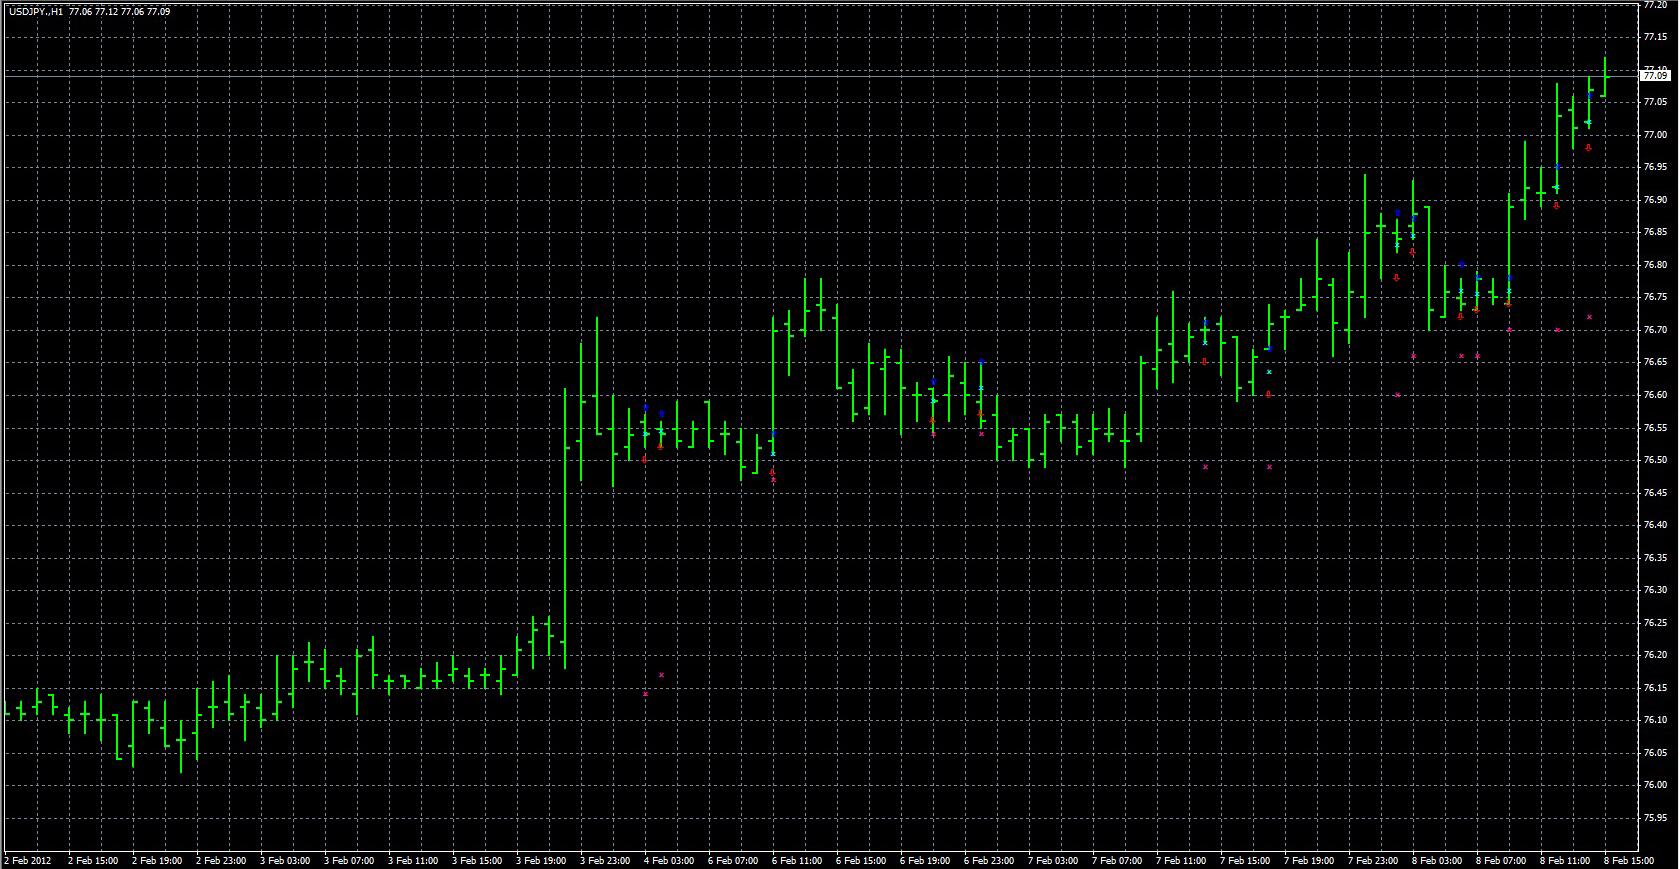 Zmfx forex trend indicator